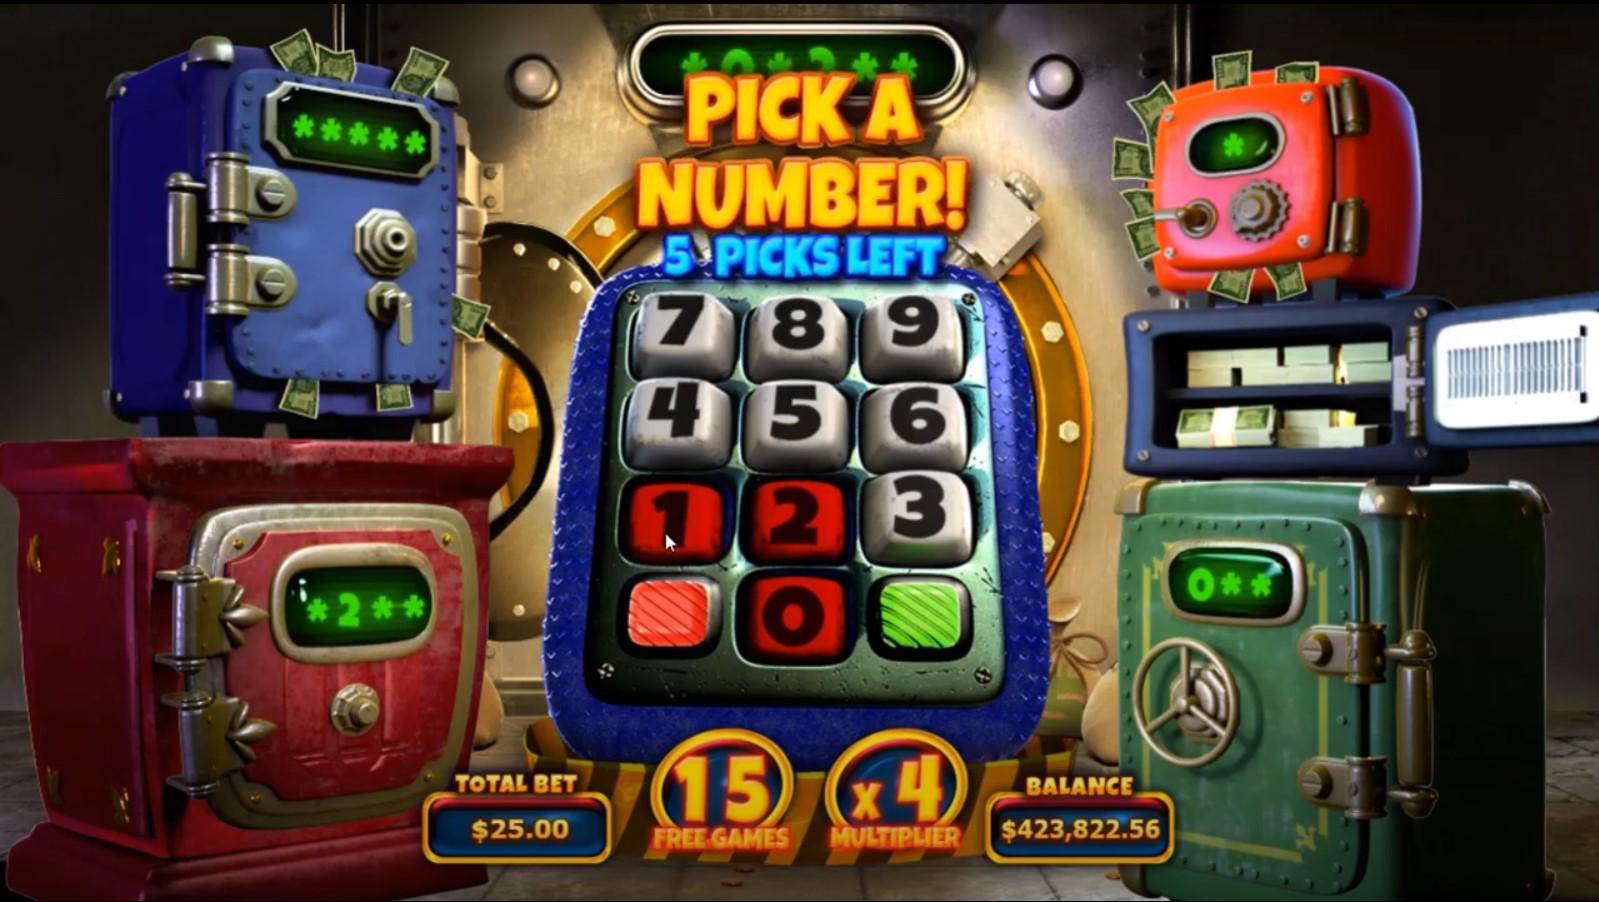 Nfl gambling lines